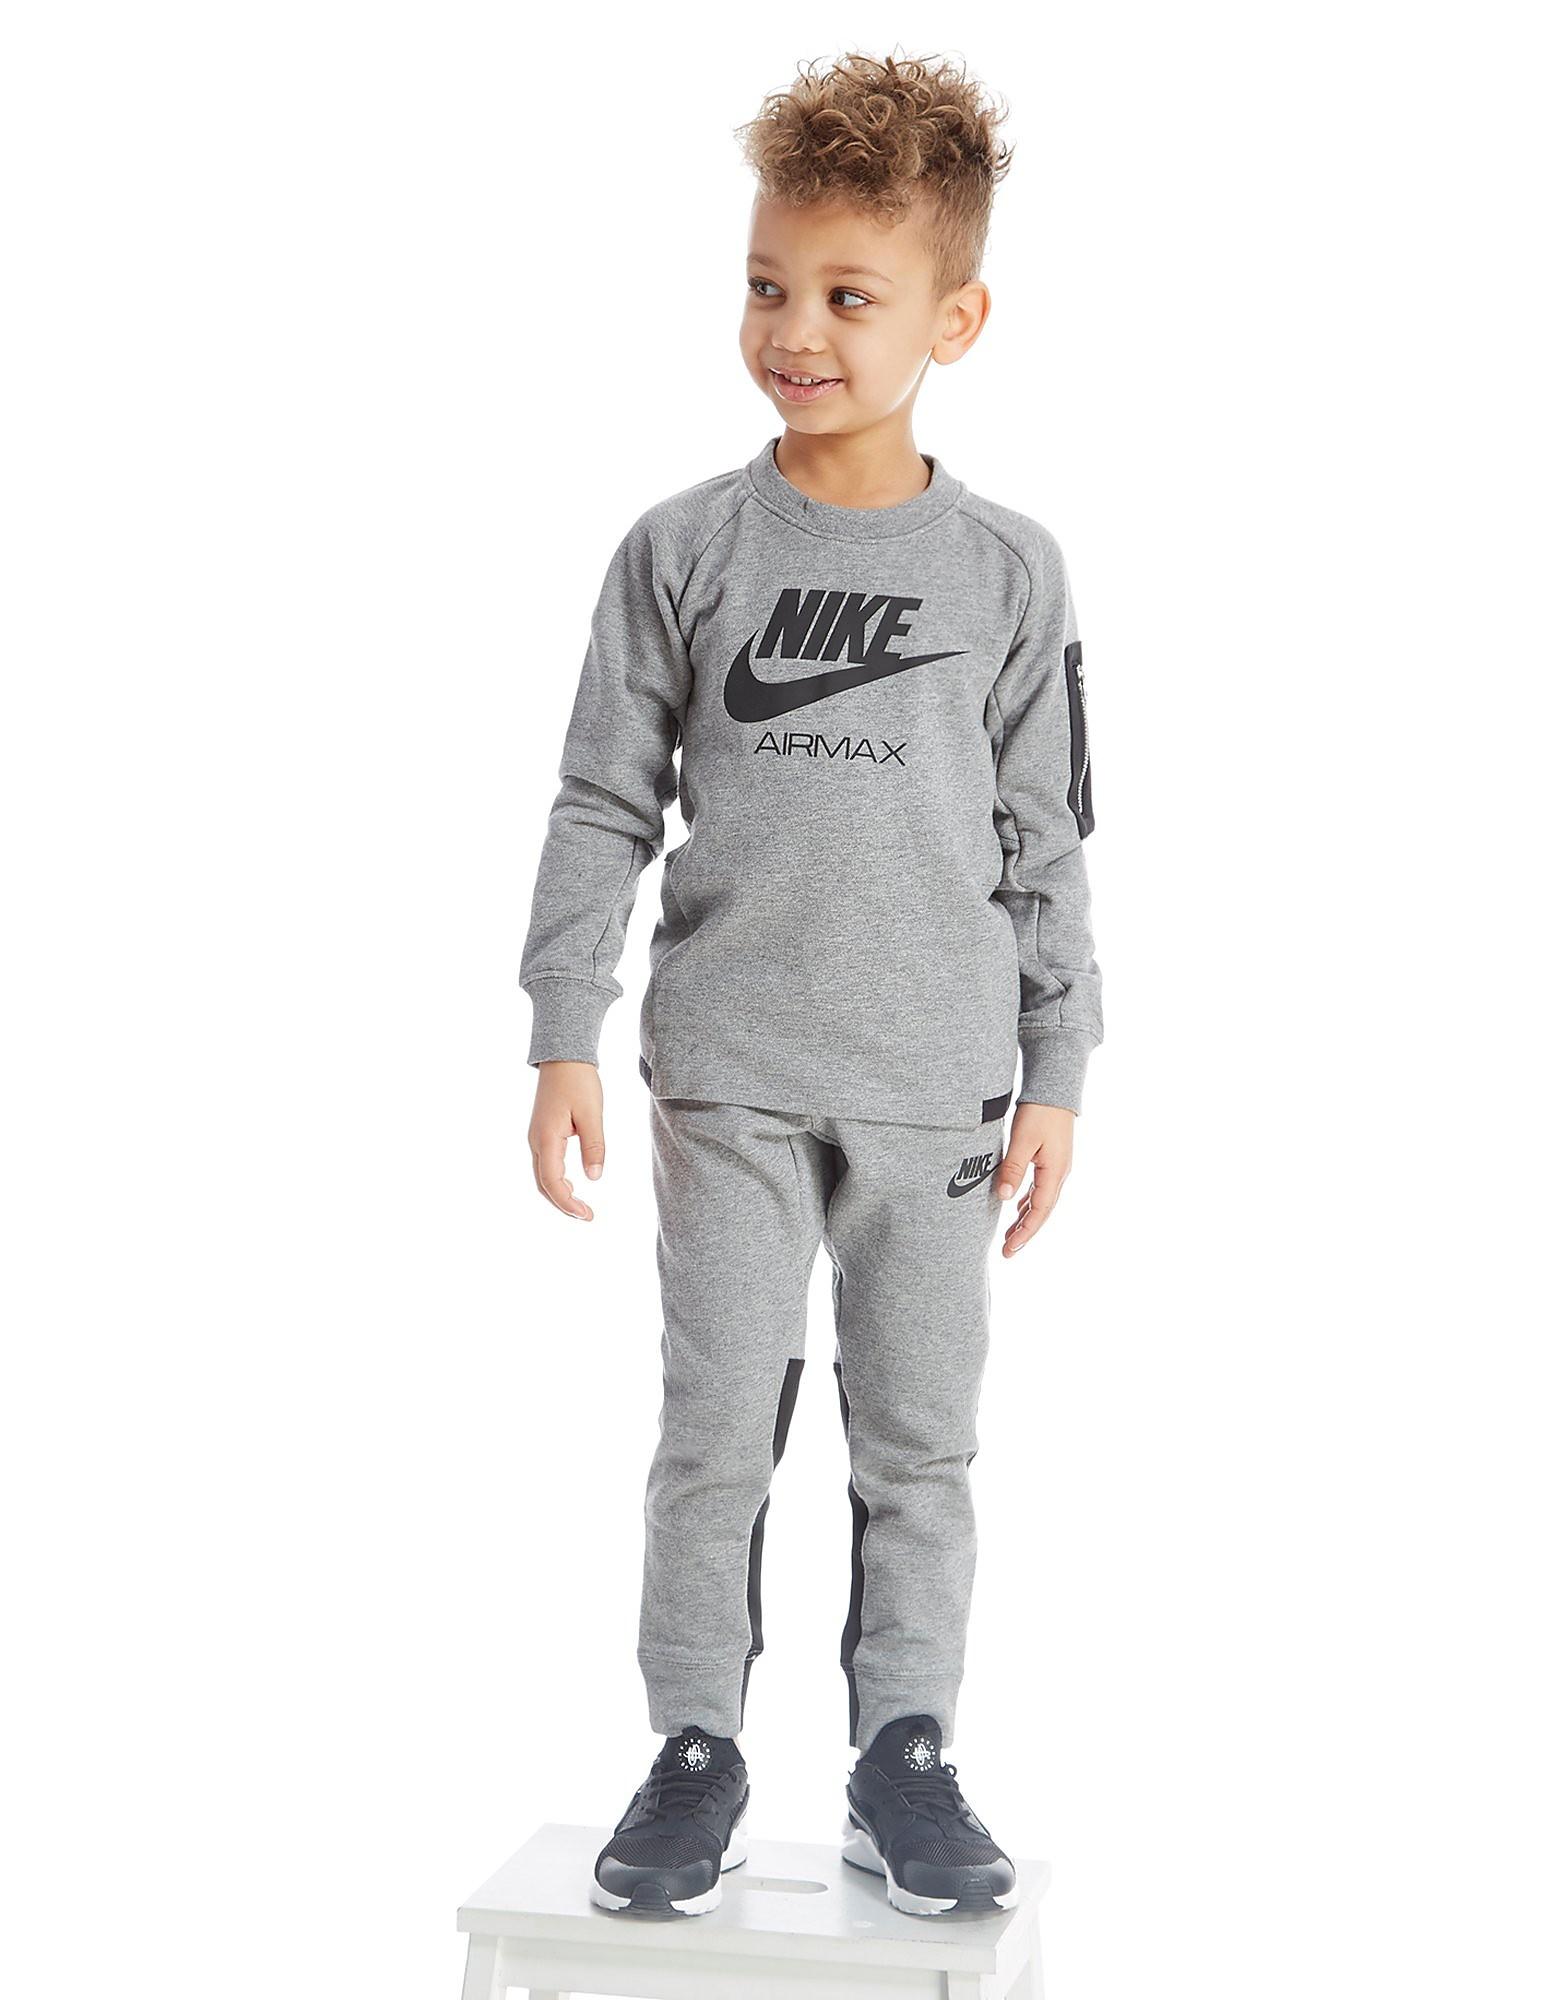 Nike Air Max Crew Tracksuit Children